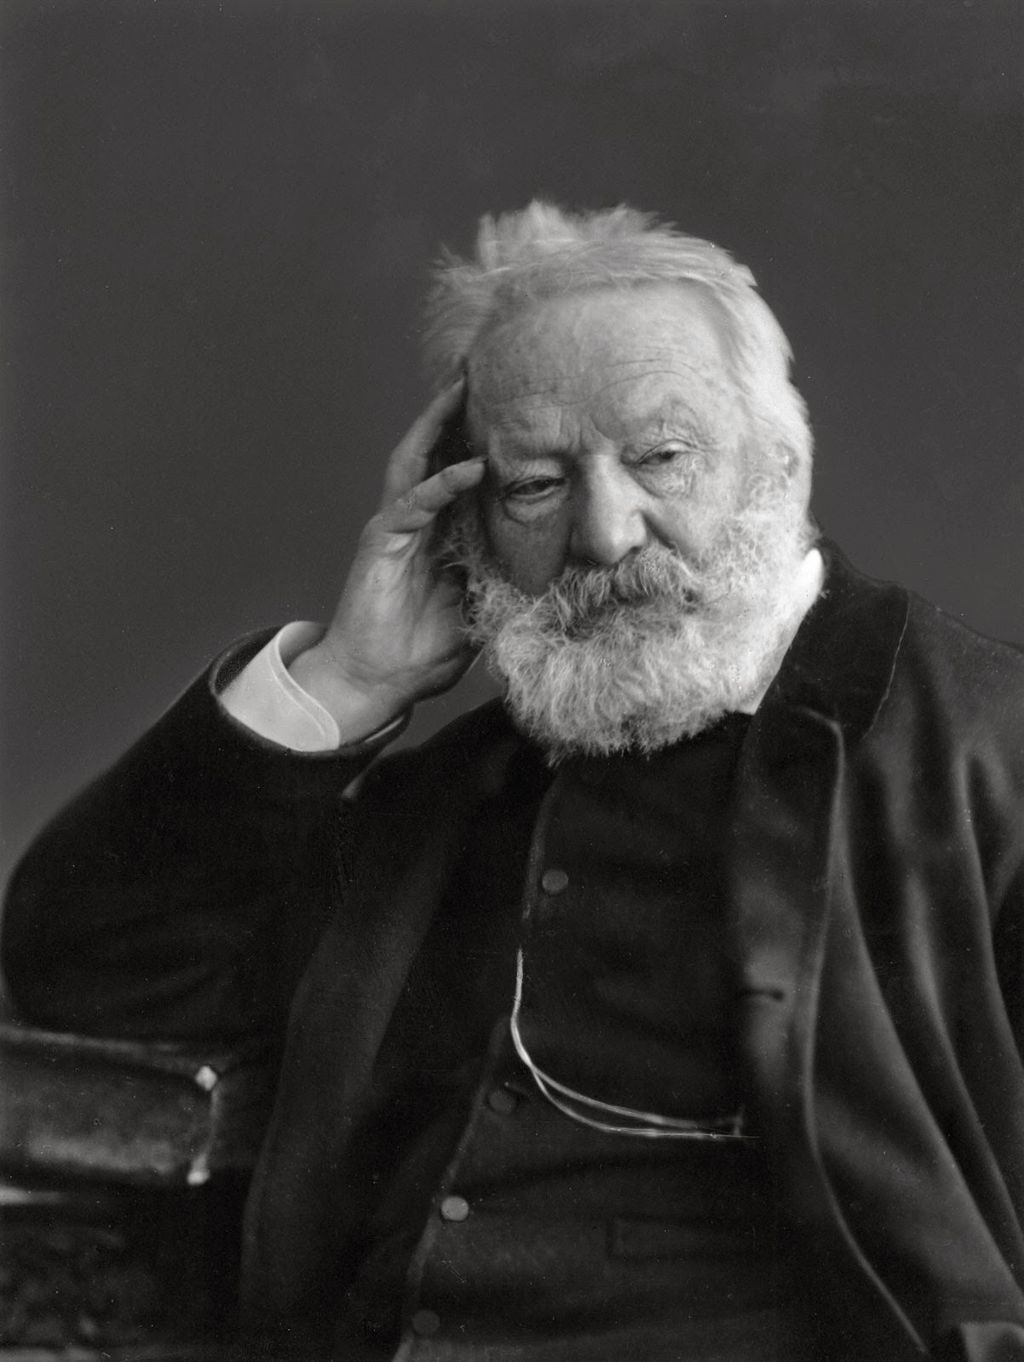 Photo courtesy of Wikimedia Commons.  Victor Hugo author of Les Misérables.